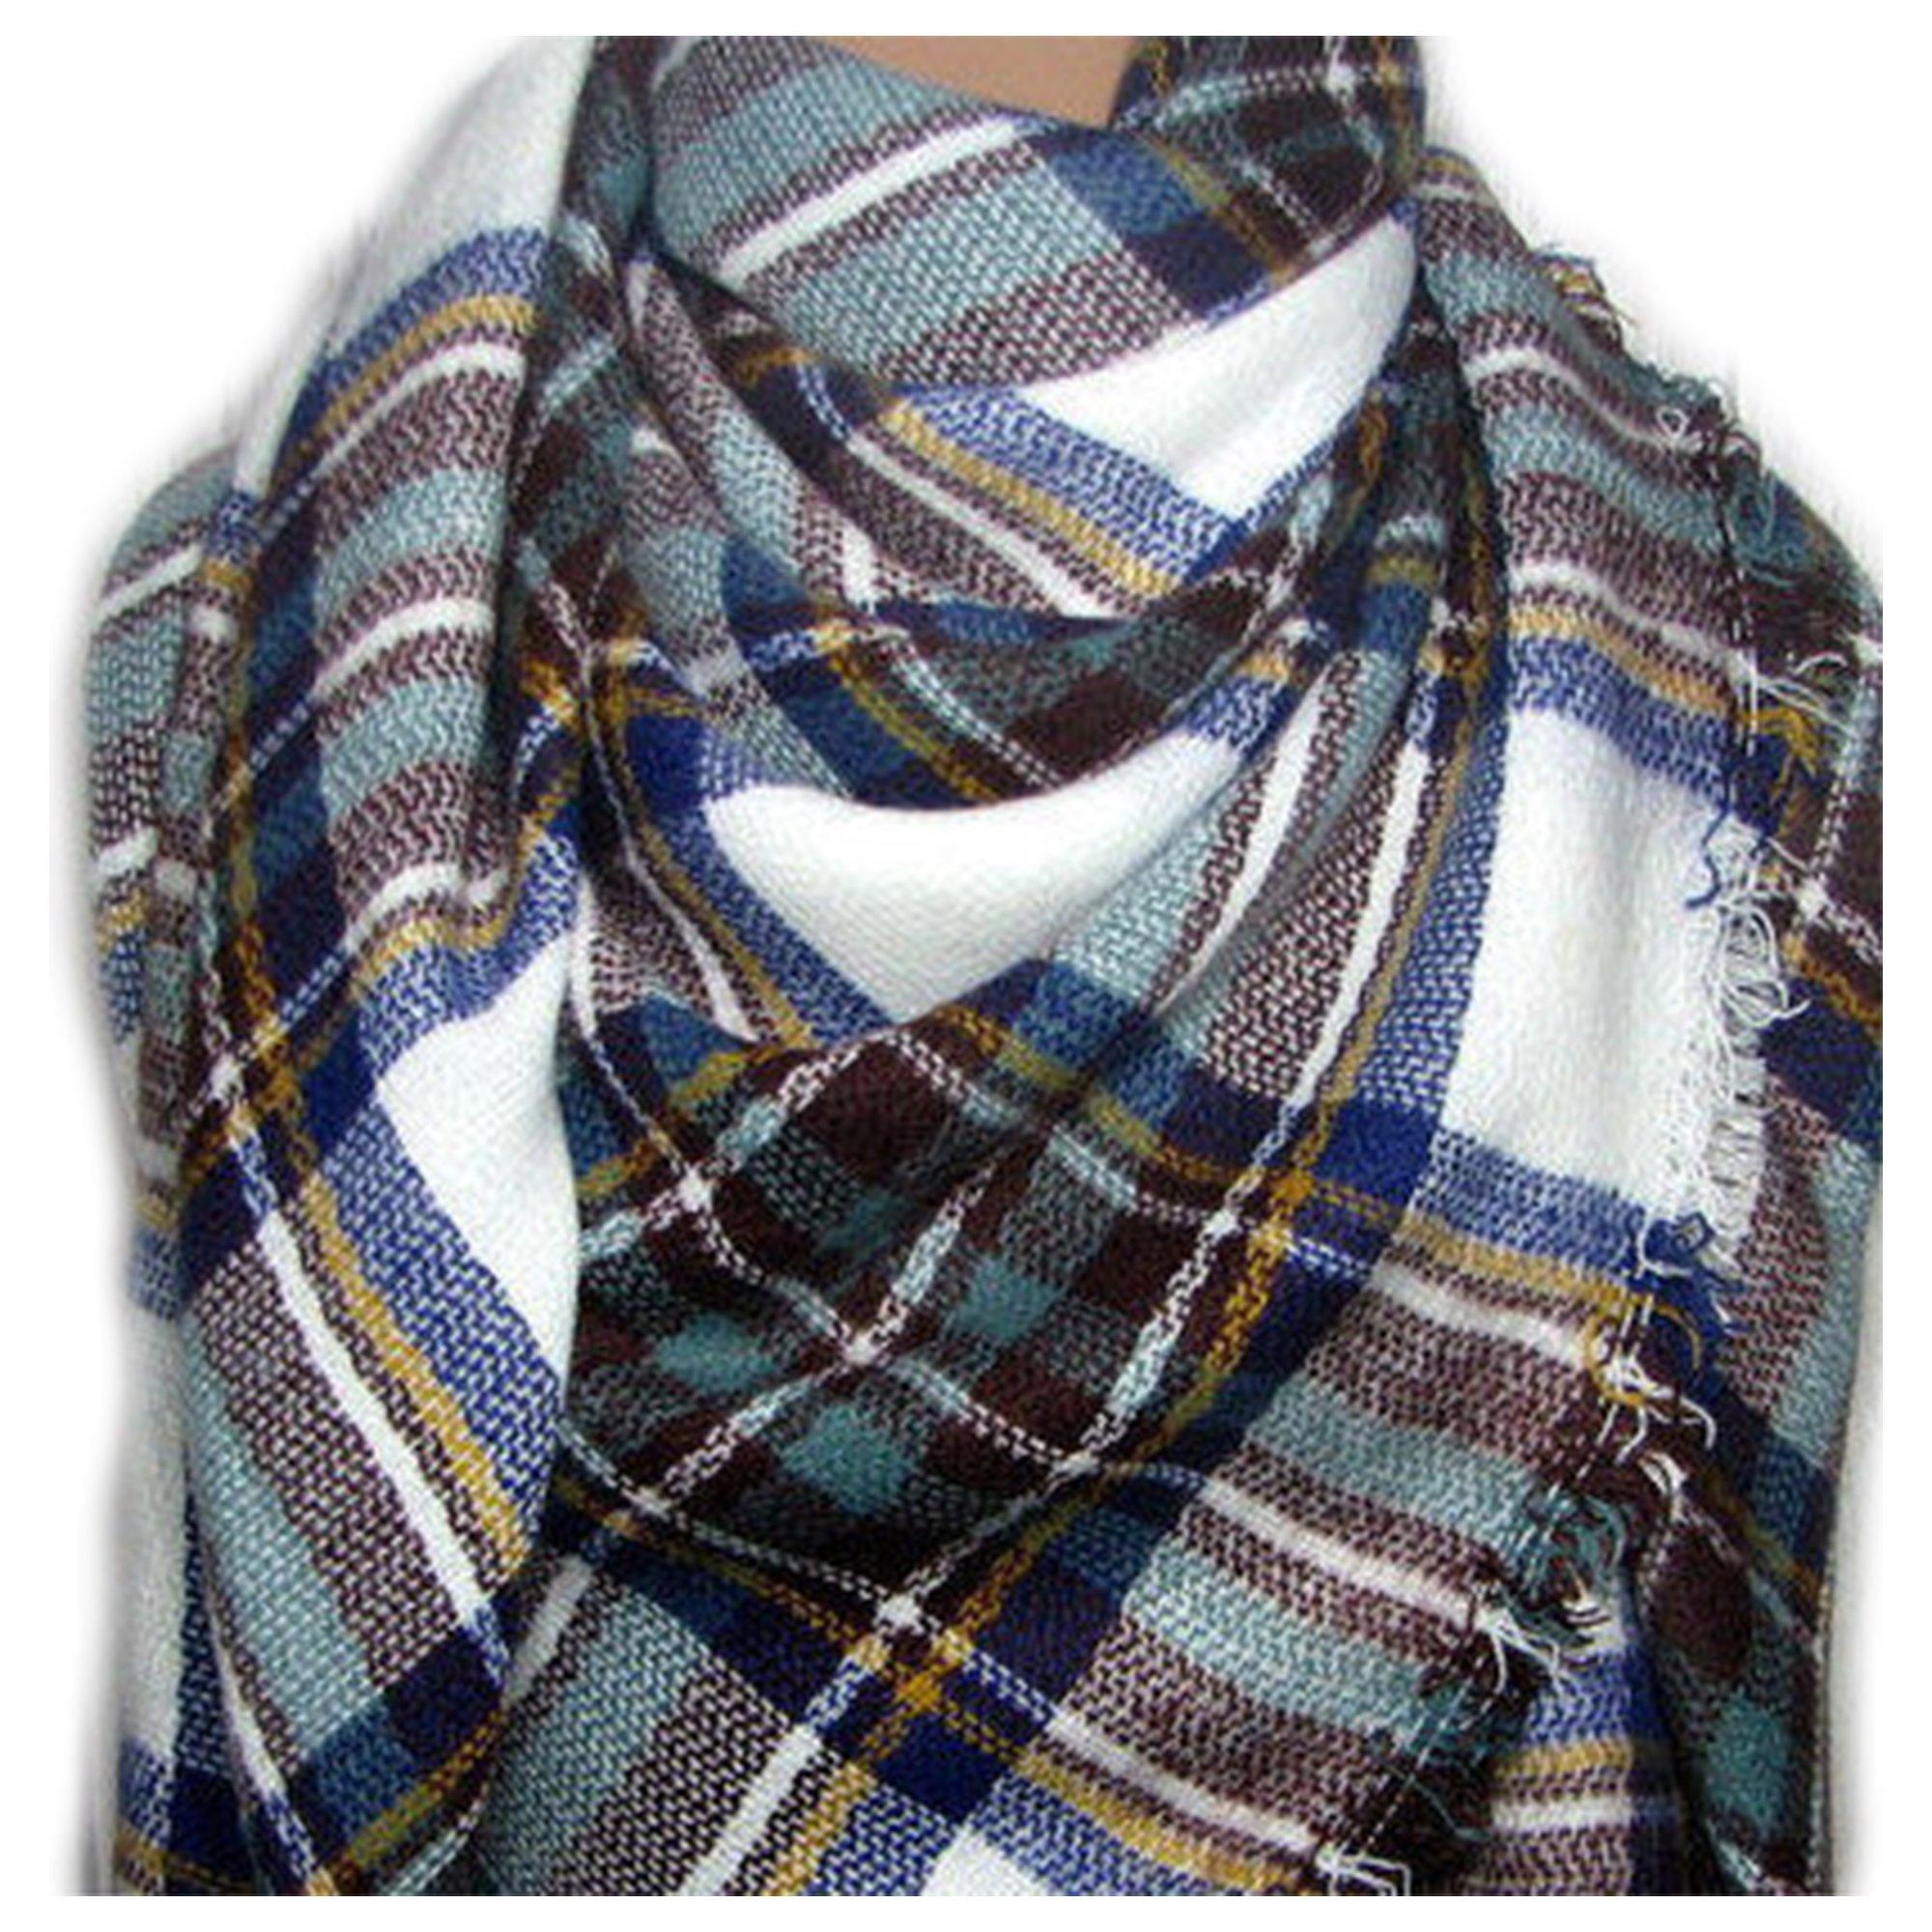 Scarfs for Women Shawls and Wraps, Head Wraps for Women, Plush Blanket, Plaid Blanket Scarf, Head Scarf for Women, Scarves, Head Wrap, Blanket Scarf, Plaid Scarf, Wraps for Women, Scarf for Women SAGE by VASTINI